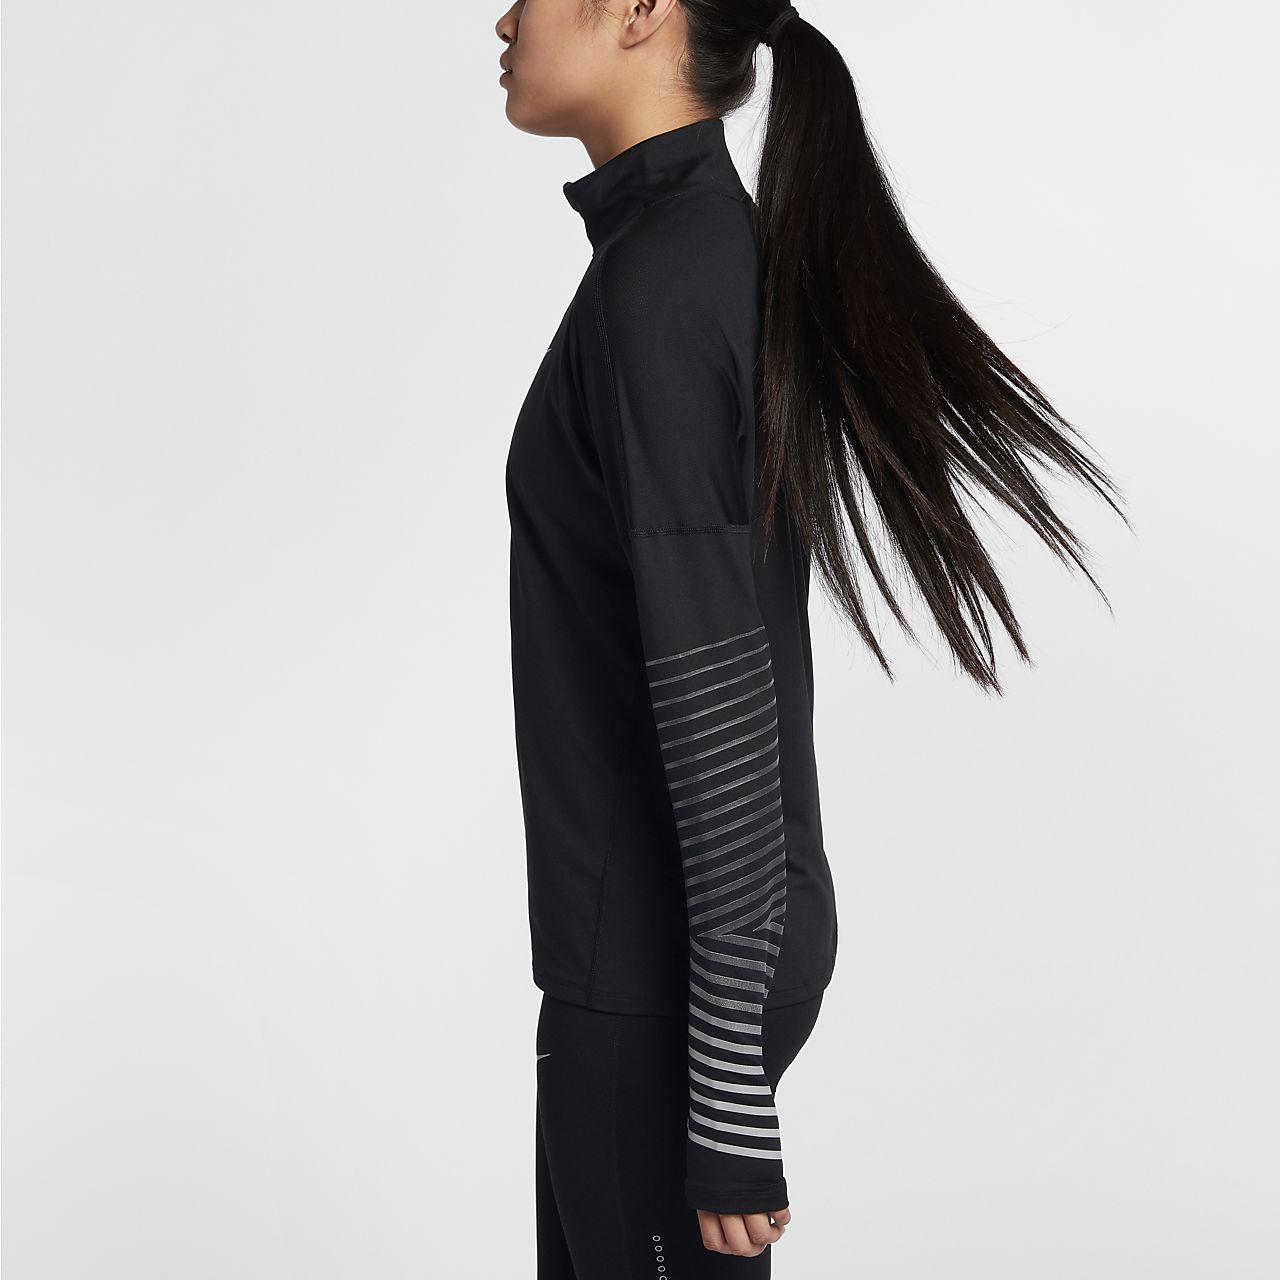 42f9e84ff6d5 ... Nike Dri-FIT Element Flash Women s Reflective Long-Sleeve Running Top